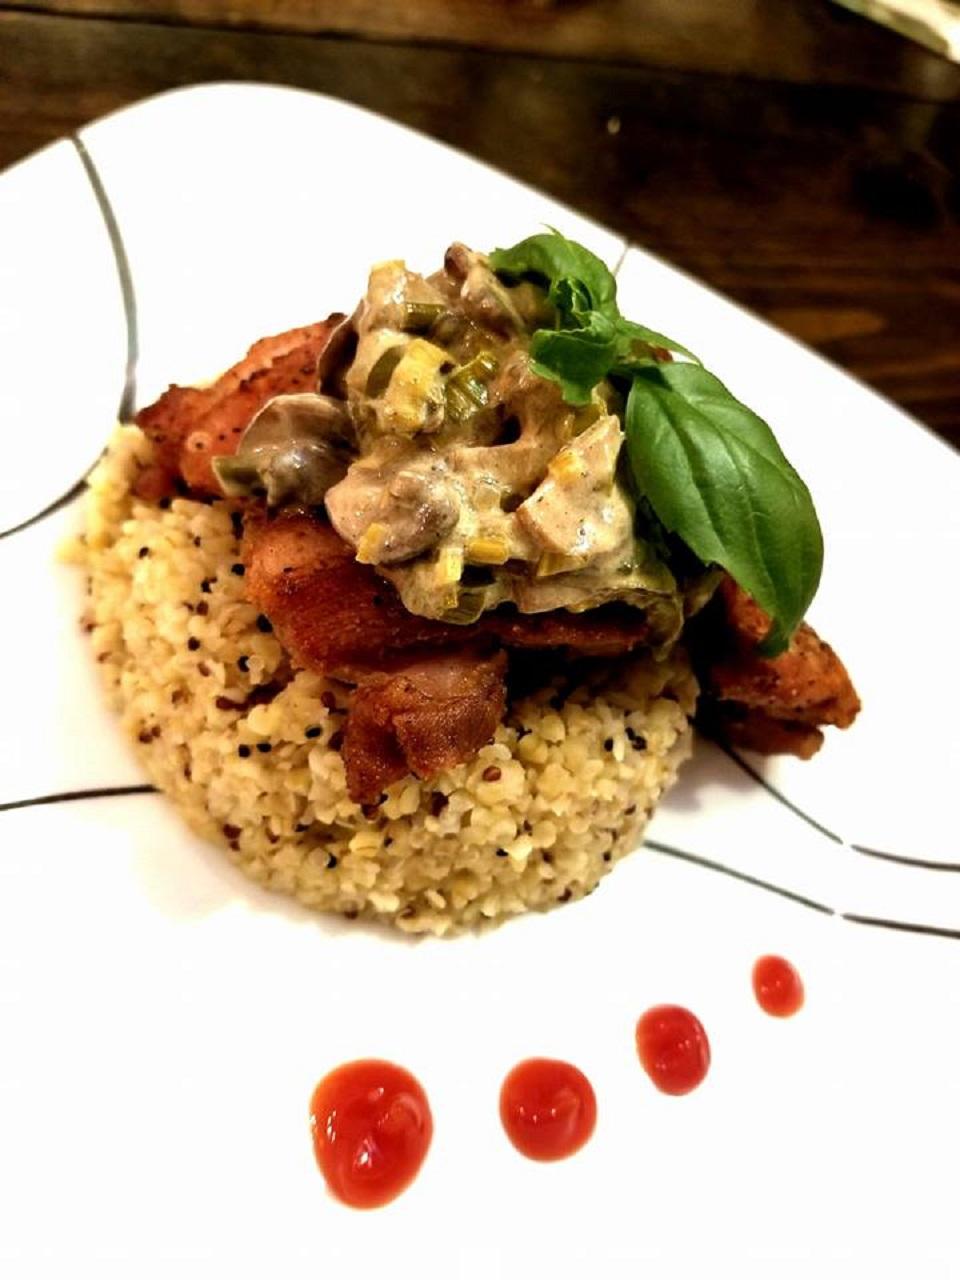 Chicken Thighs with Mushroom-Leek Sauce